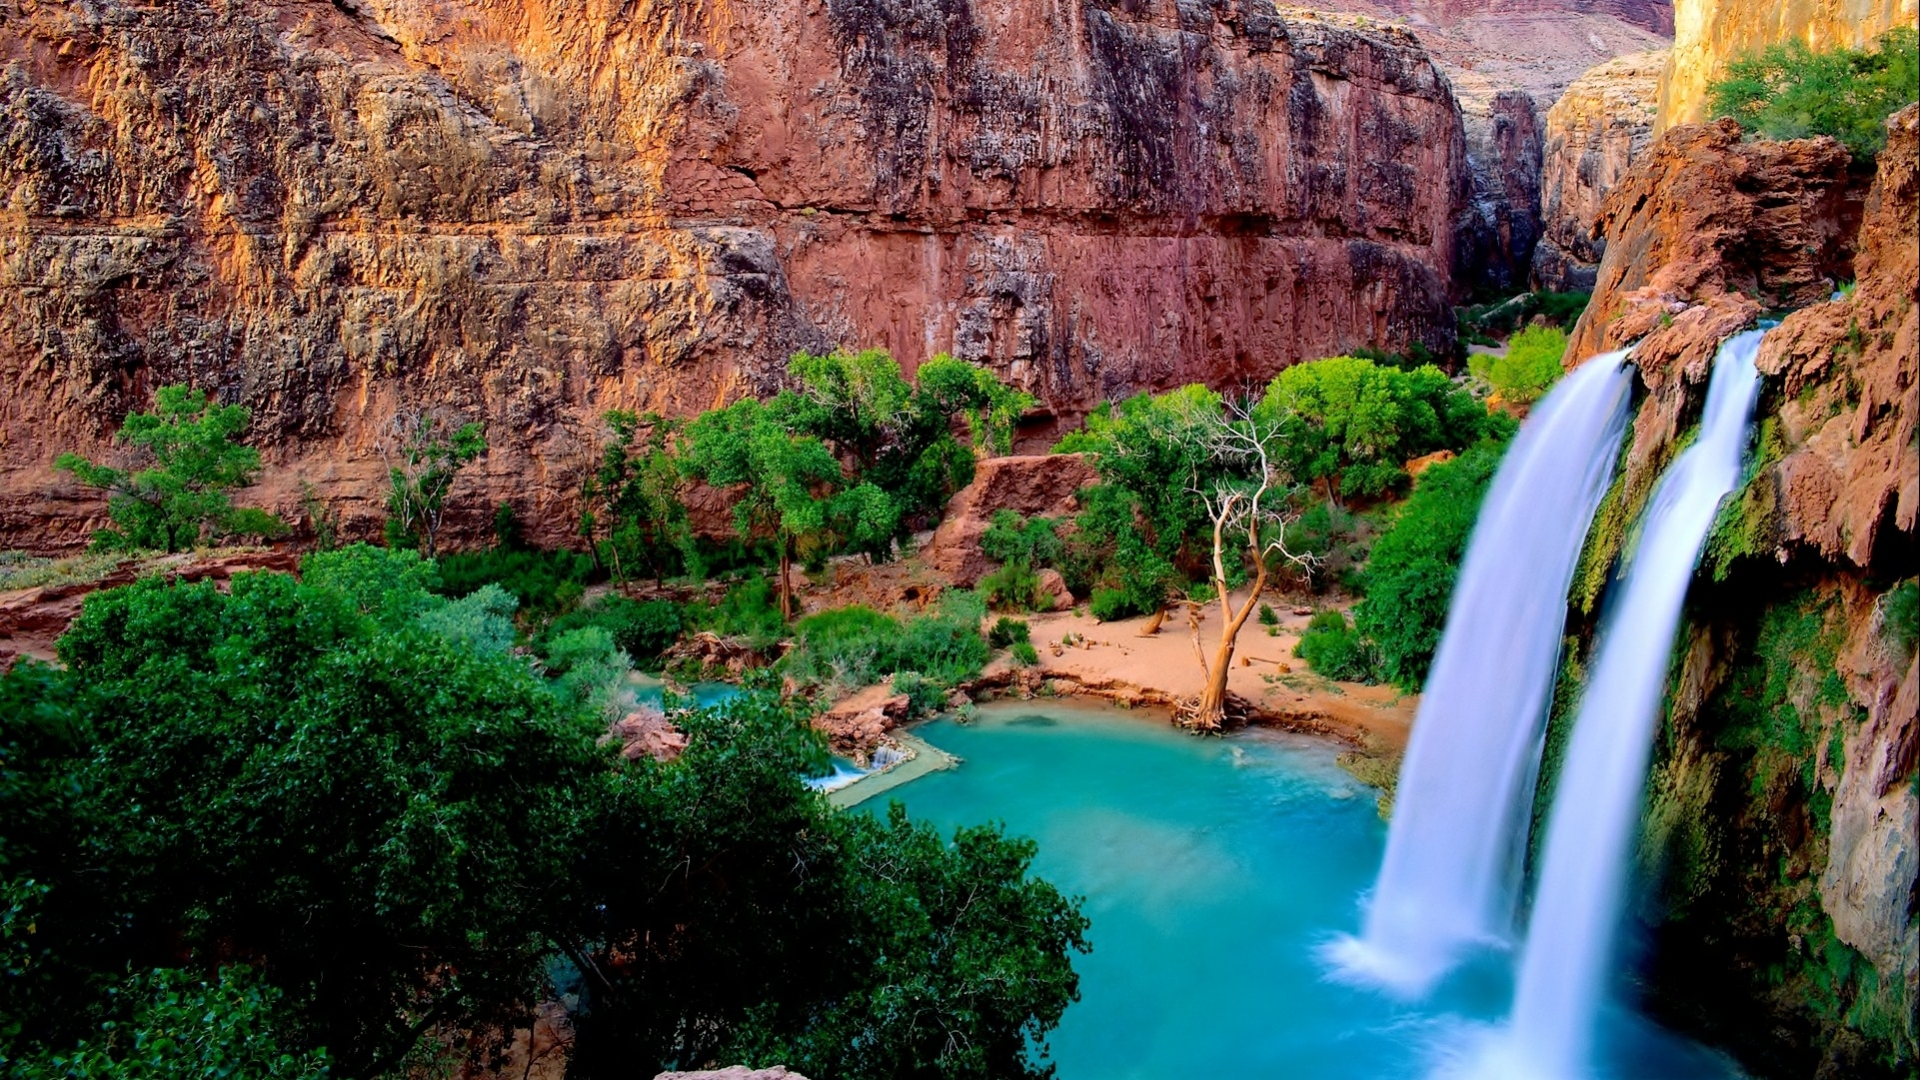 waterfalls wallpapers most beautiful - photo #15